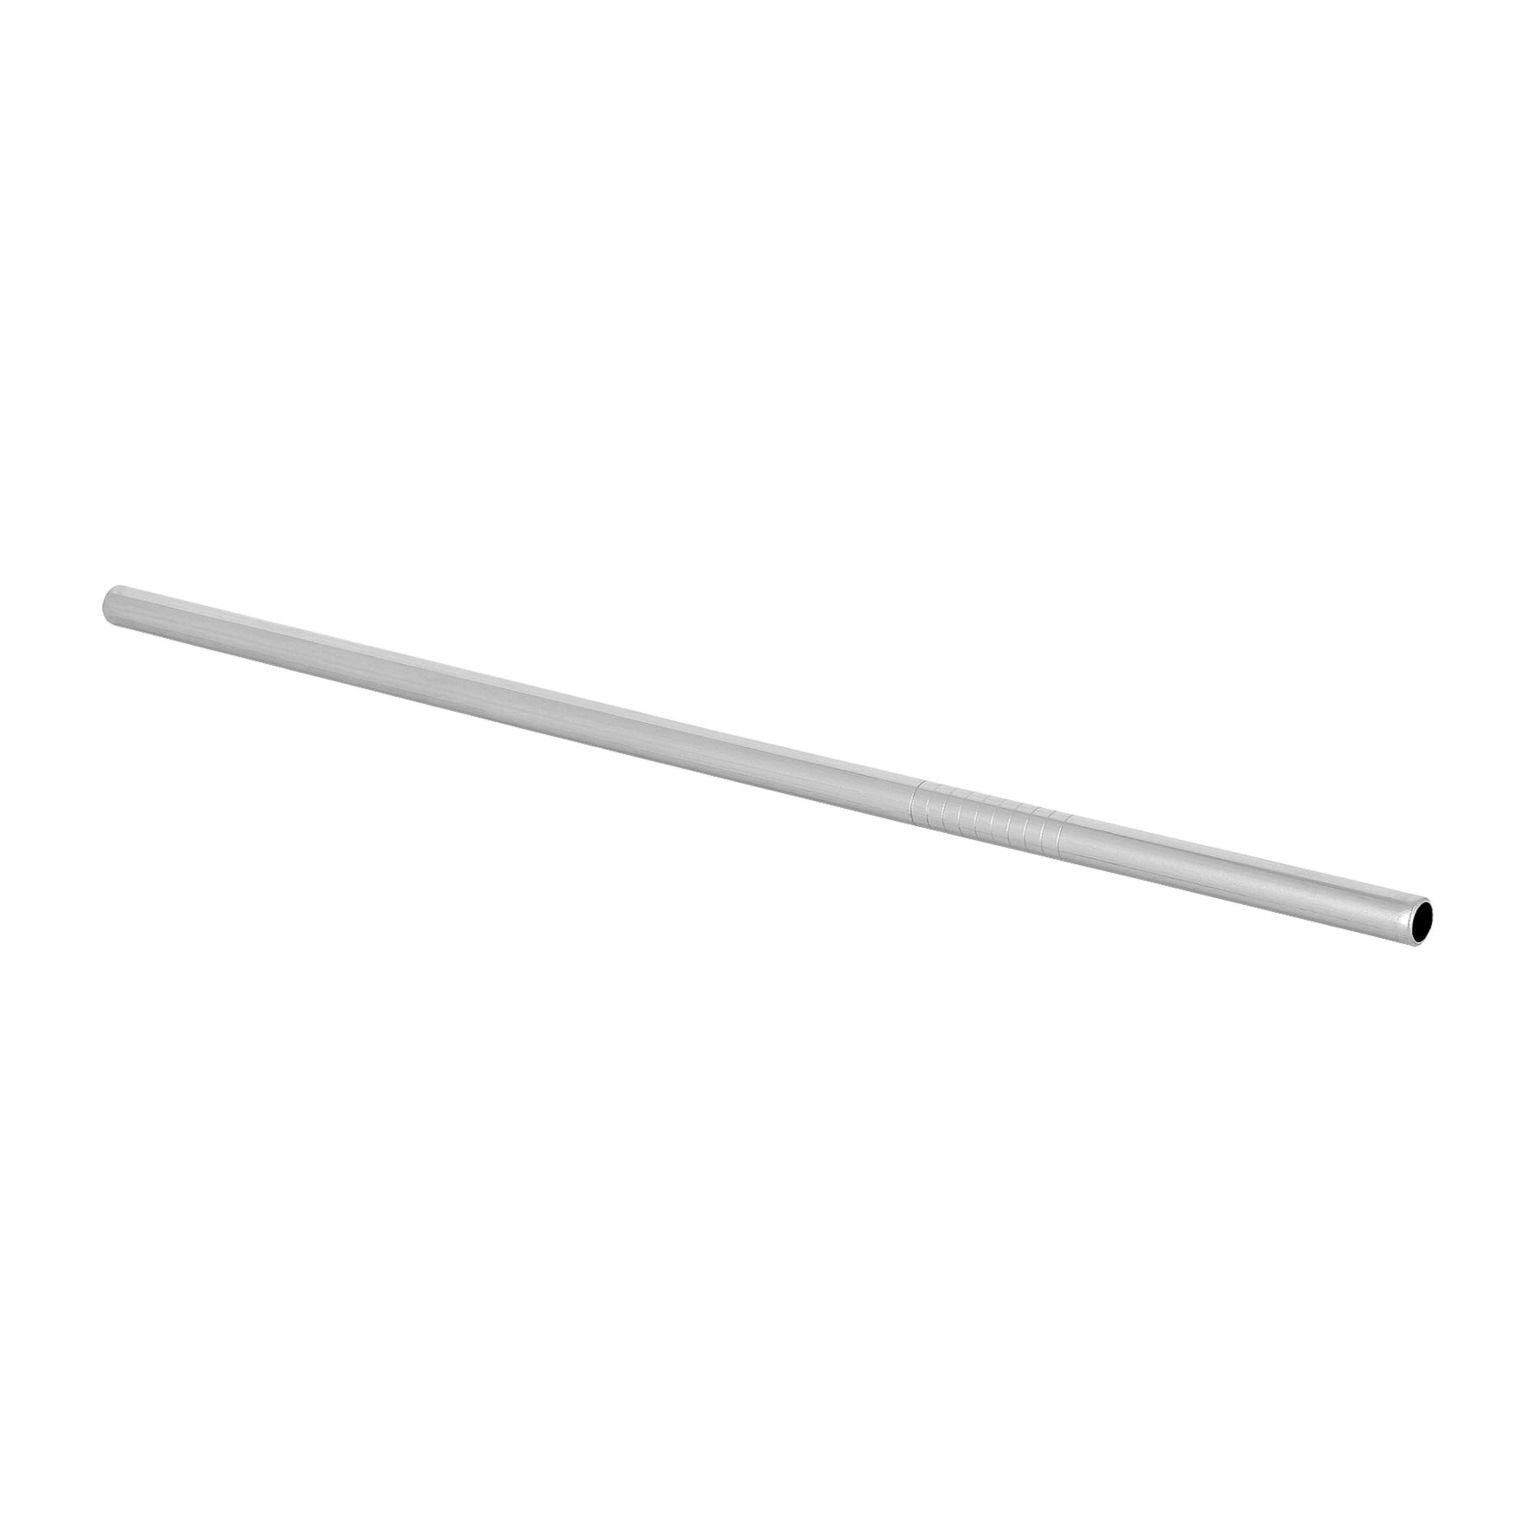 Paille inox 21.5cm